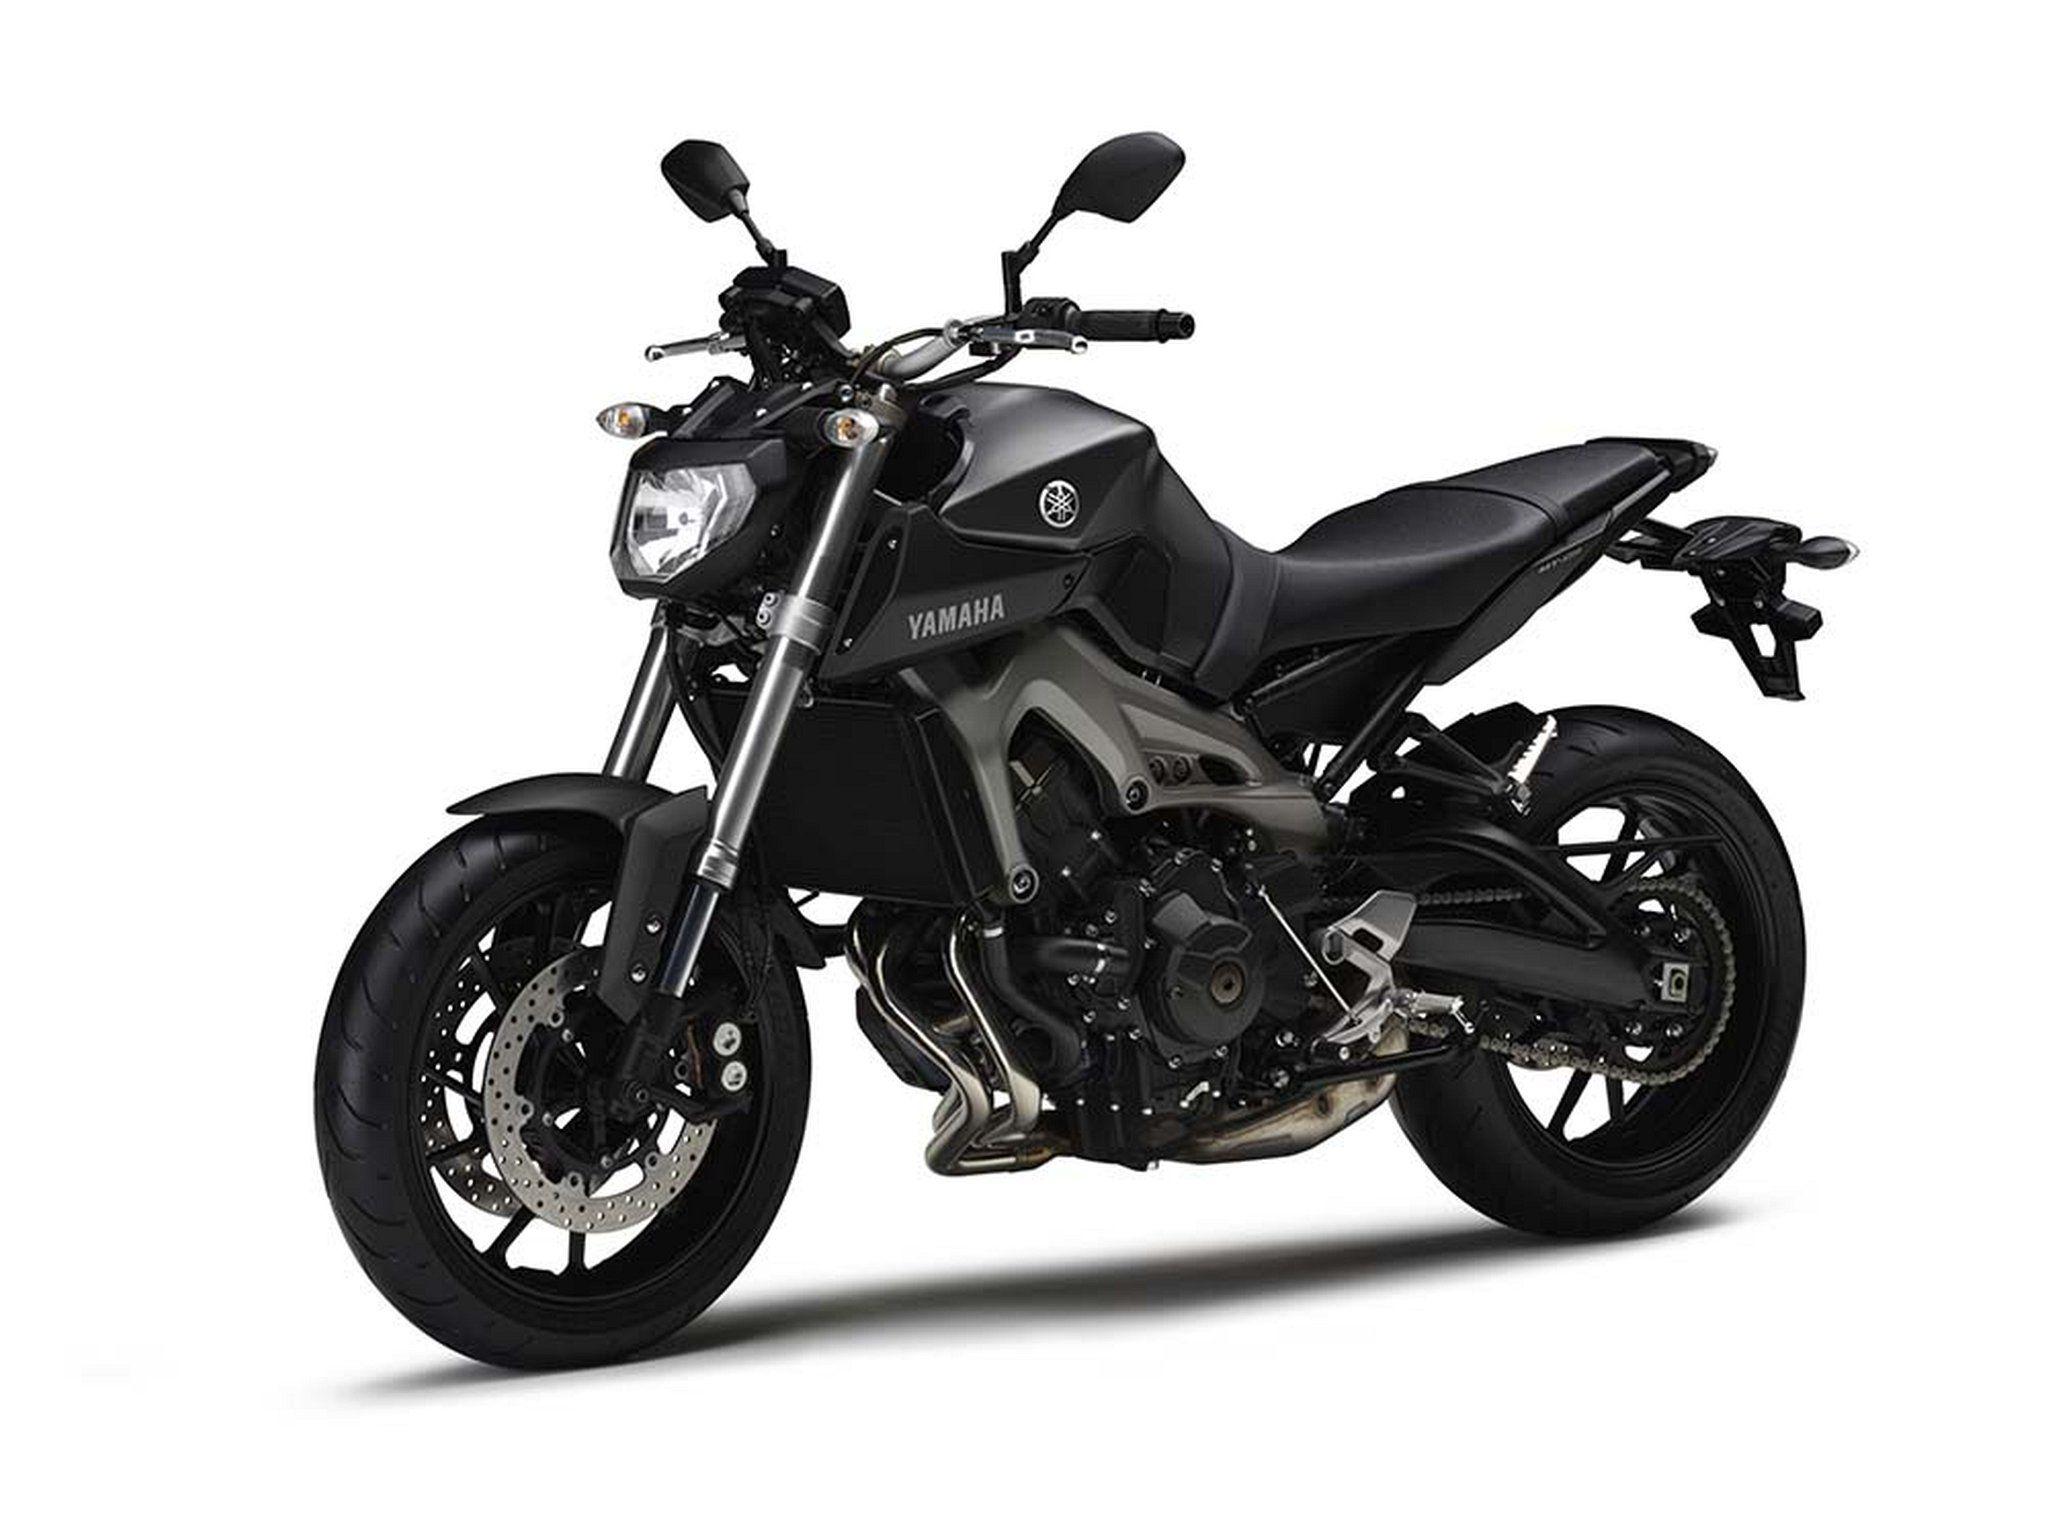 Yamaha MT09 Nächste Generation der MTModellreihe Мотоцикл